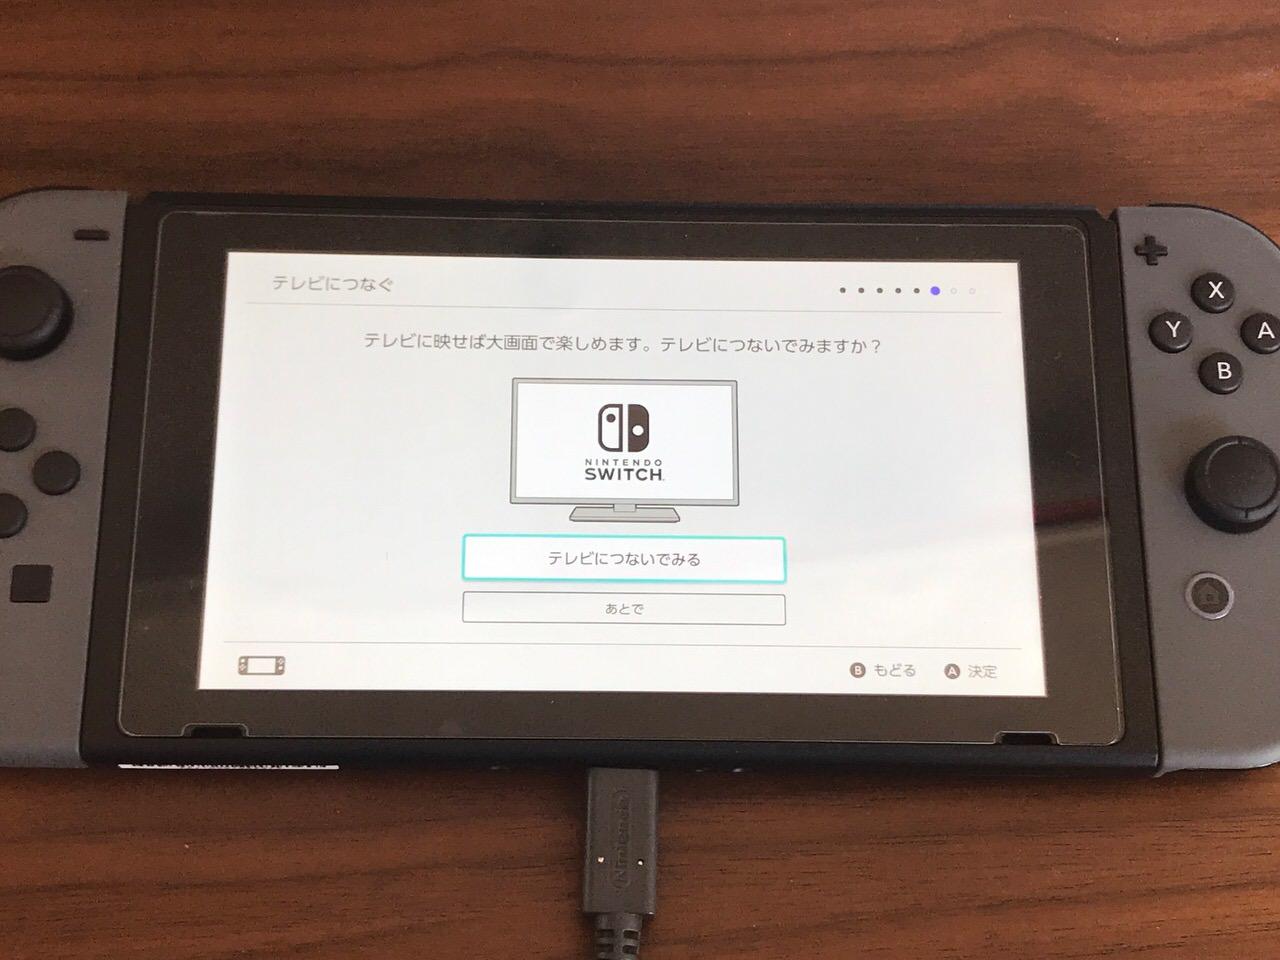 Nintendo switch setup 6764